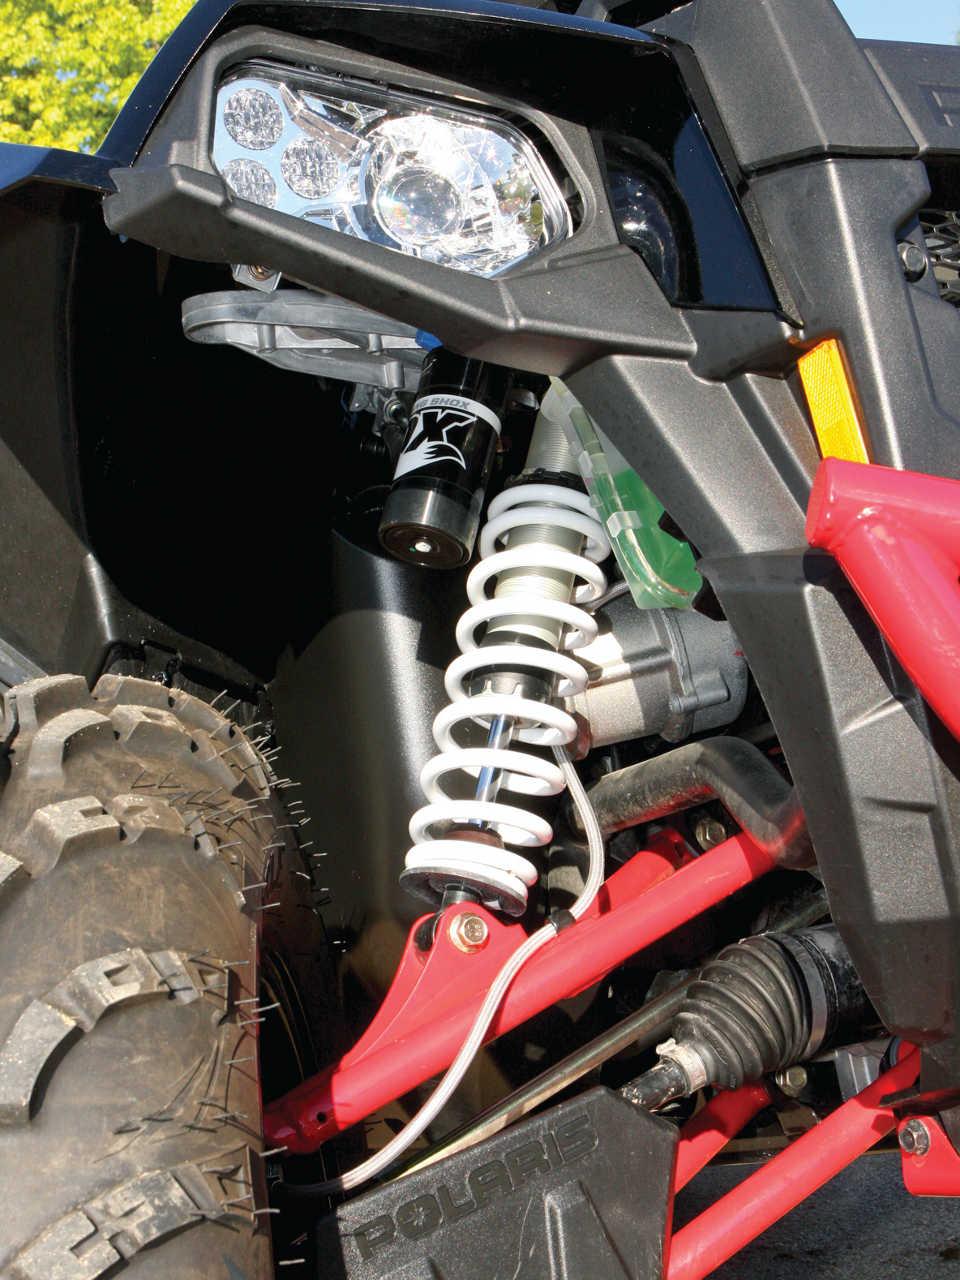 New Machine Test - Scramble On | ATV Illustrated